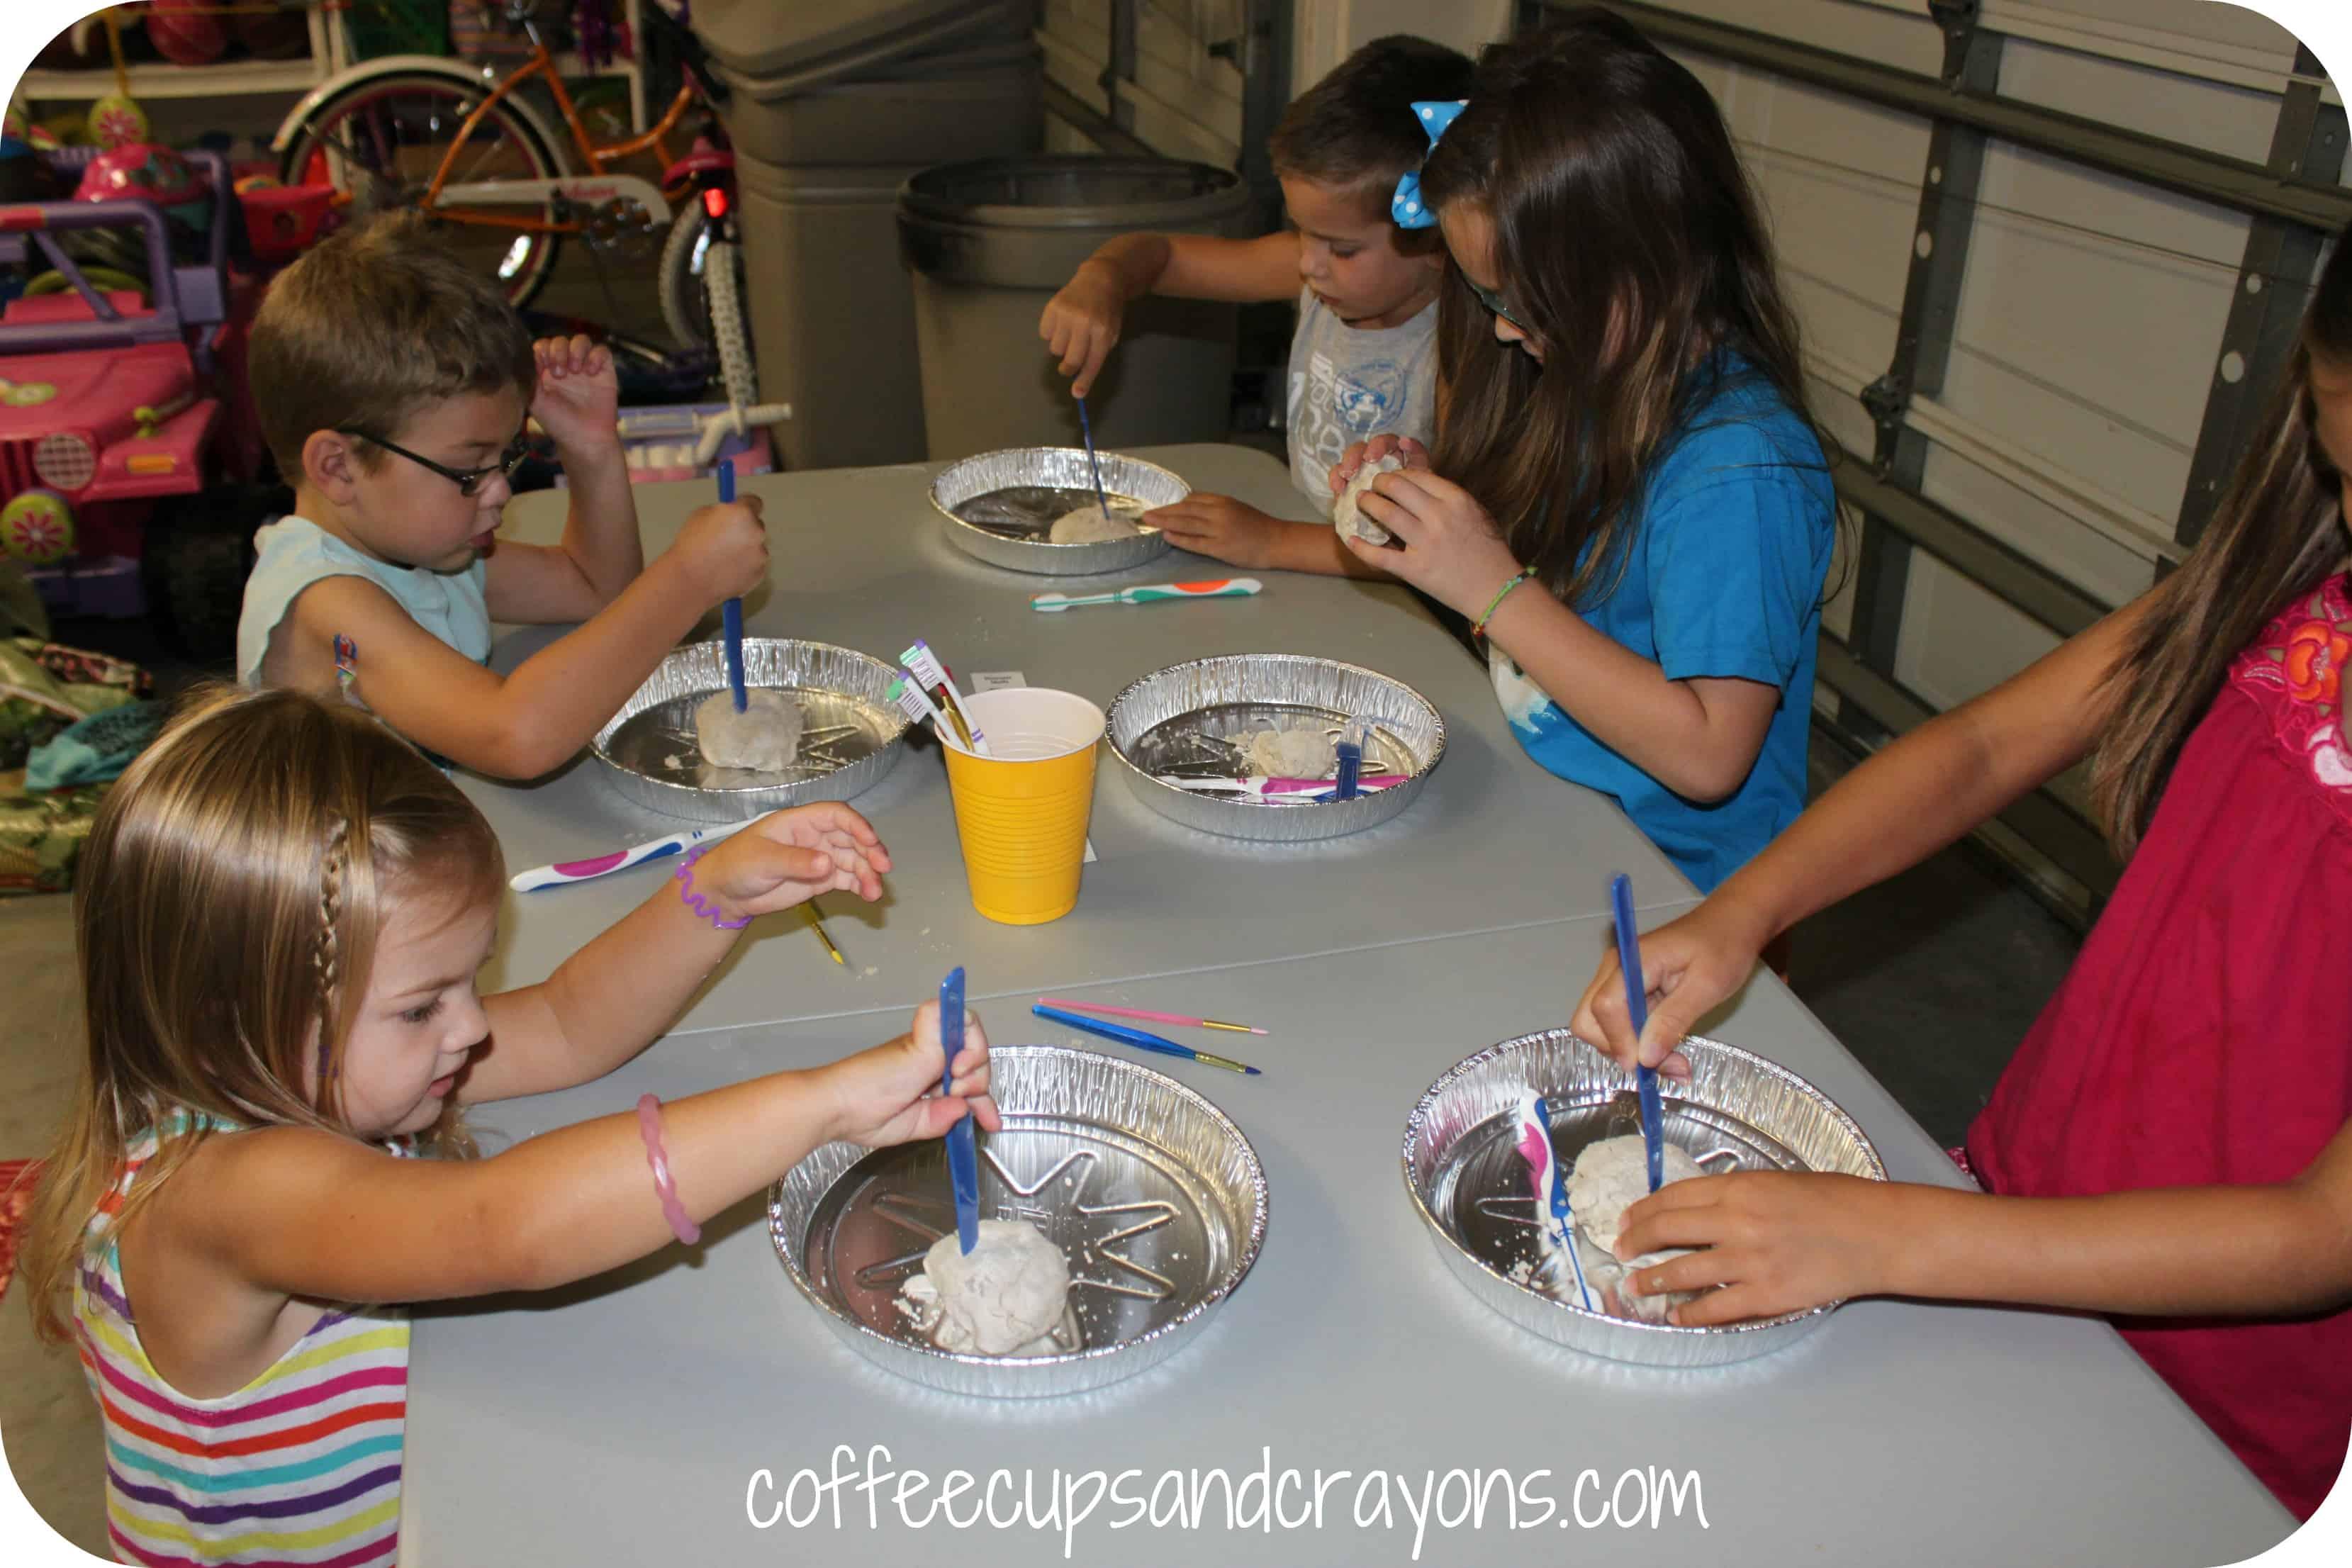 Ff A Dddff F E B B Bc F A Space Station Role Play also Sumbm likewise Planning Pt Ice Cream further D Bb C F E E Dece likewise Ice Cream Paint X. on preschool activities ice cream